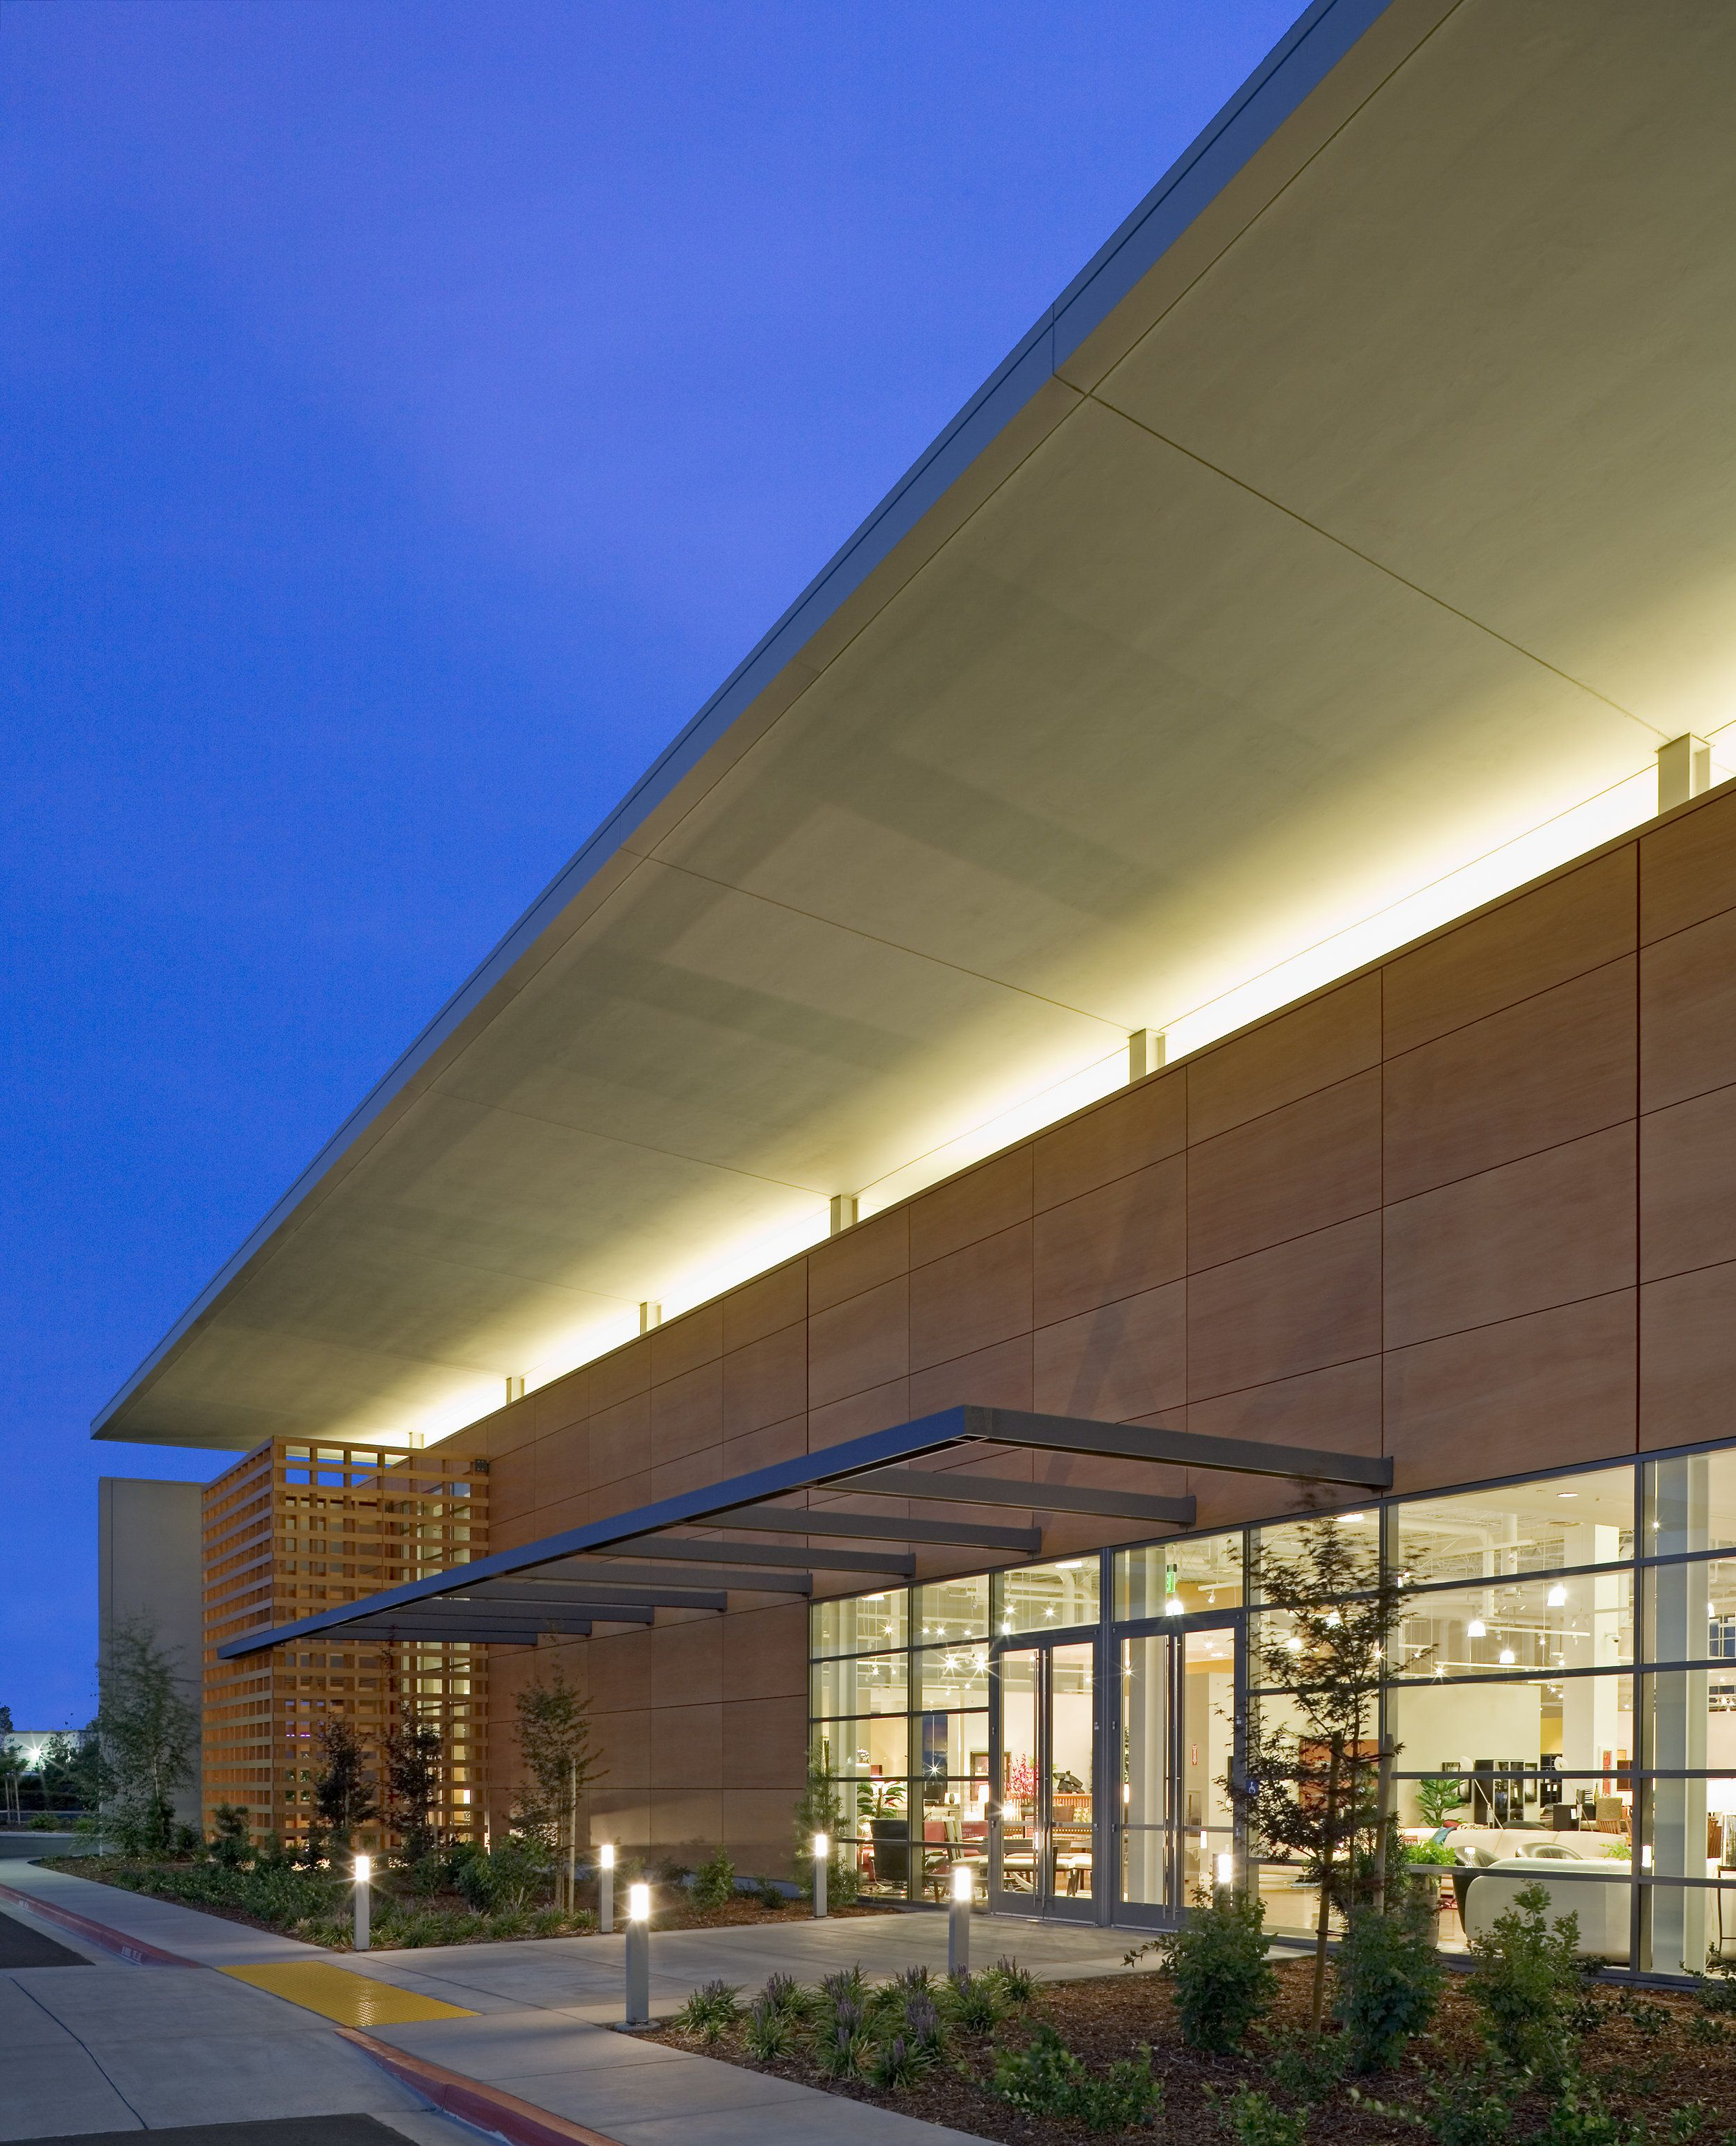 Scandinavian Designs Rocklin Retail Architecture Roth Sheppard In 2020 Retail Architecture Architecture Scandinavian Design